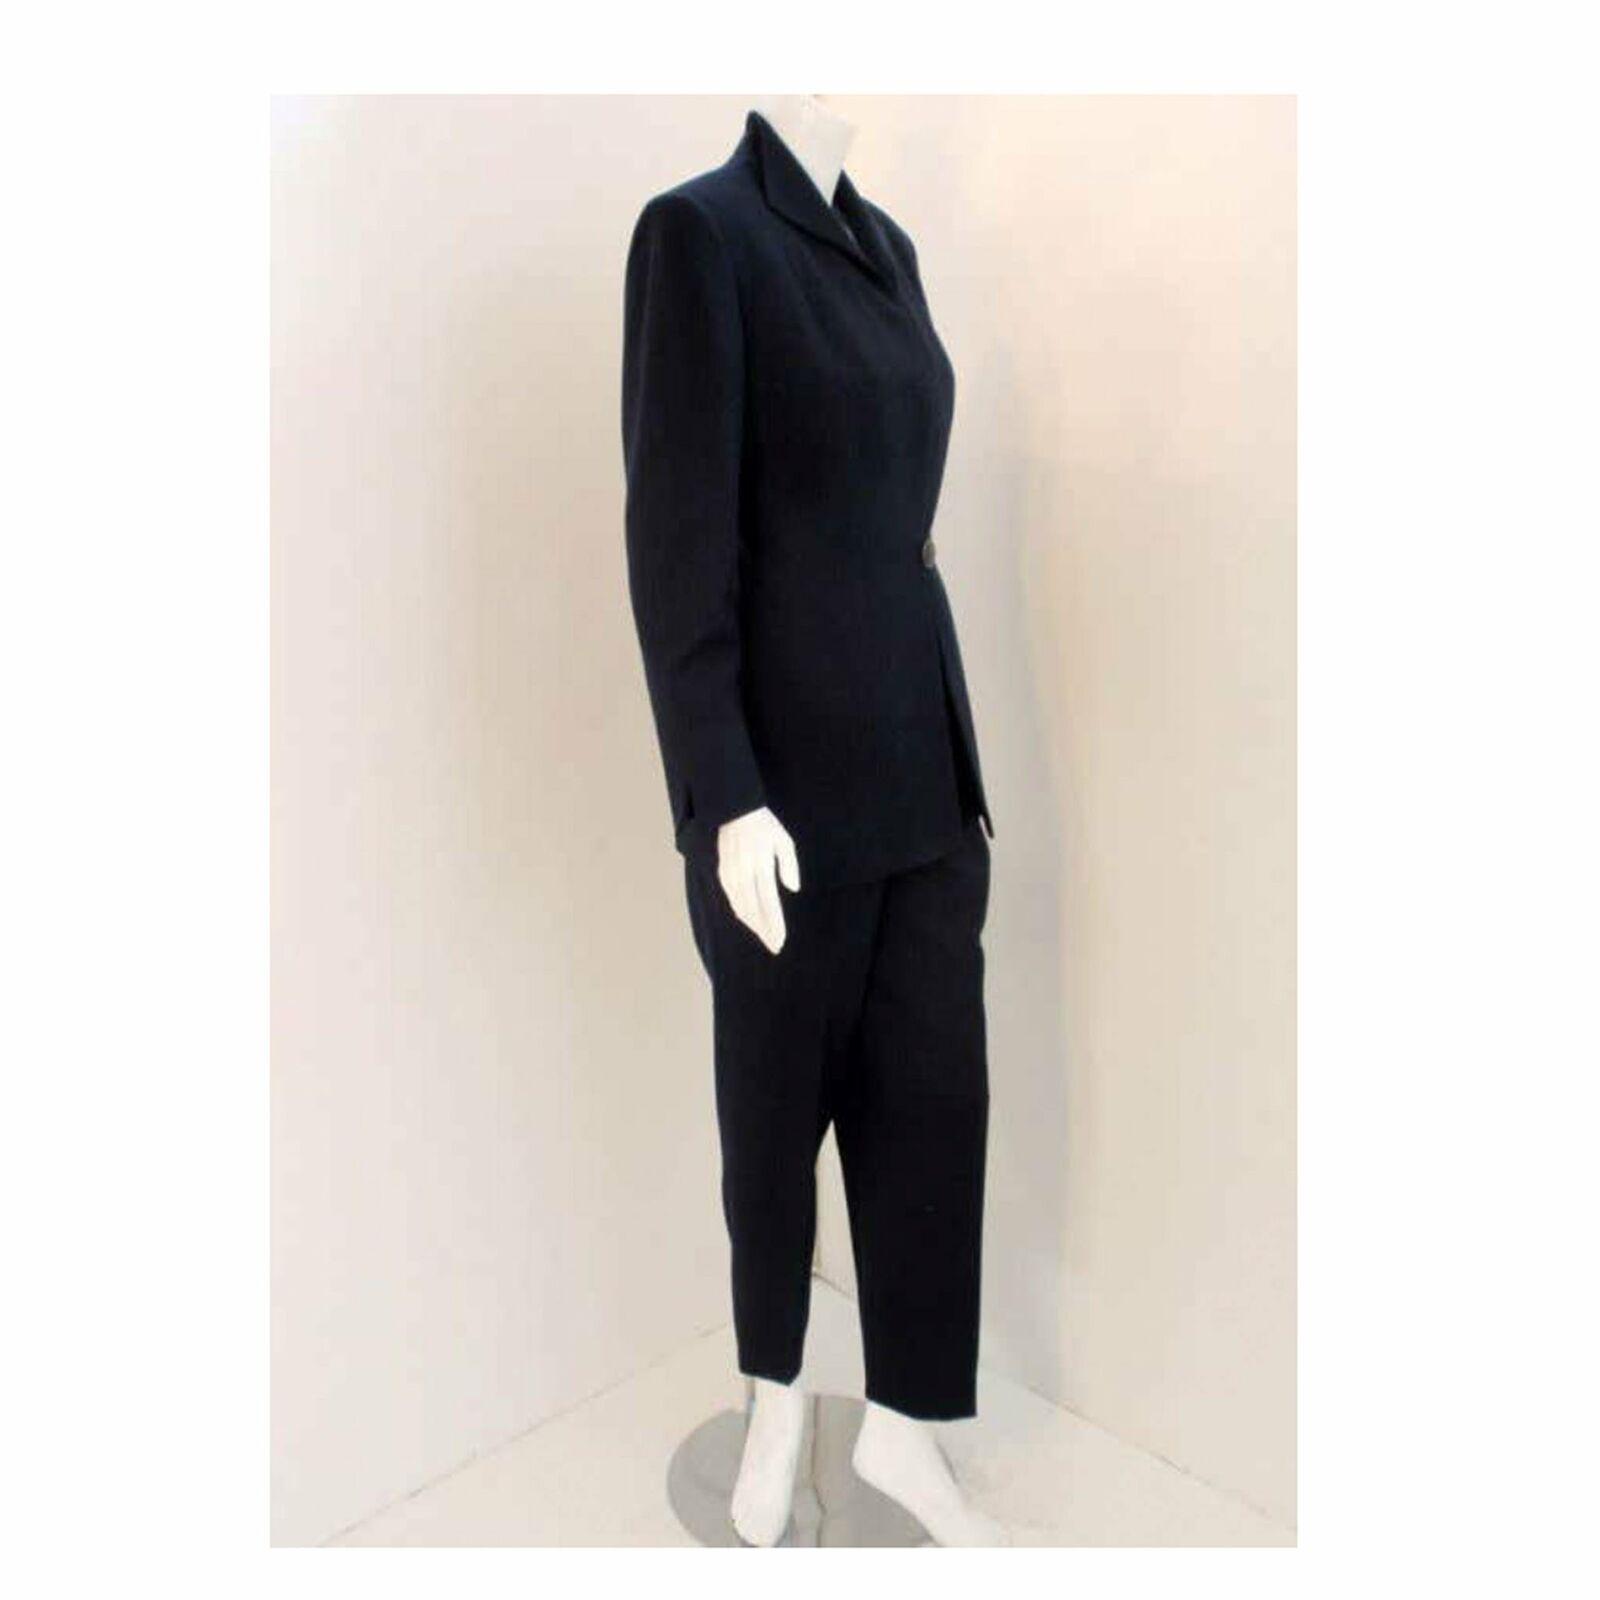 CHRISTIAN DIOR 1980s 2 pc Dark Blue Pant Suit - image 5